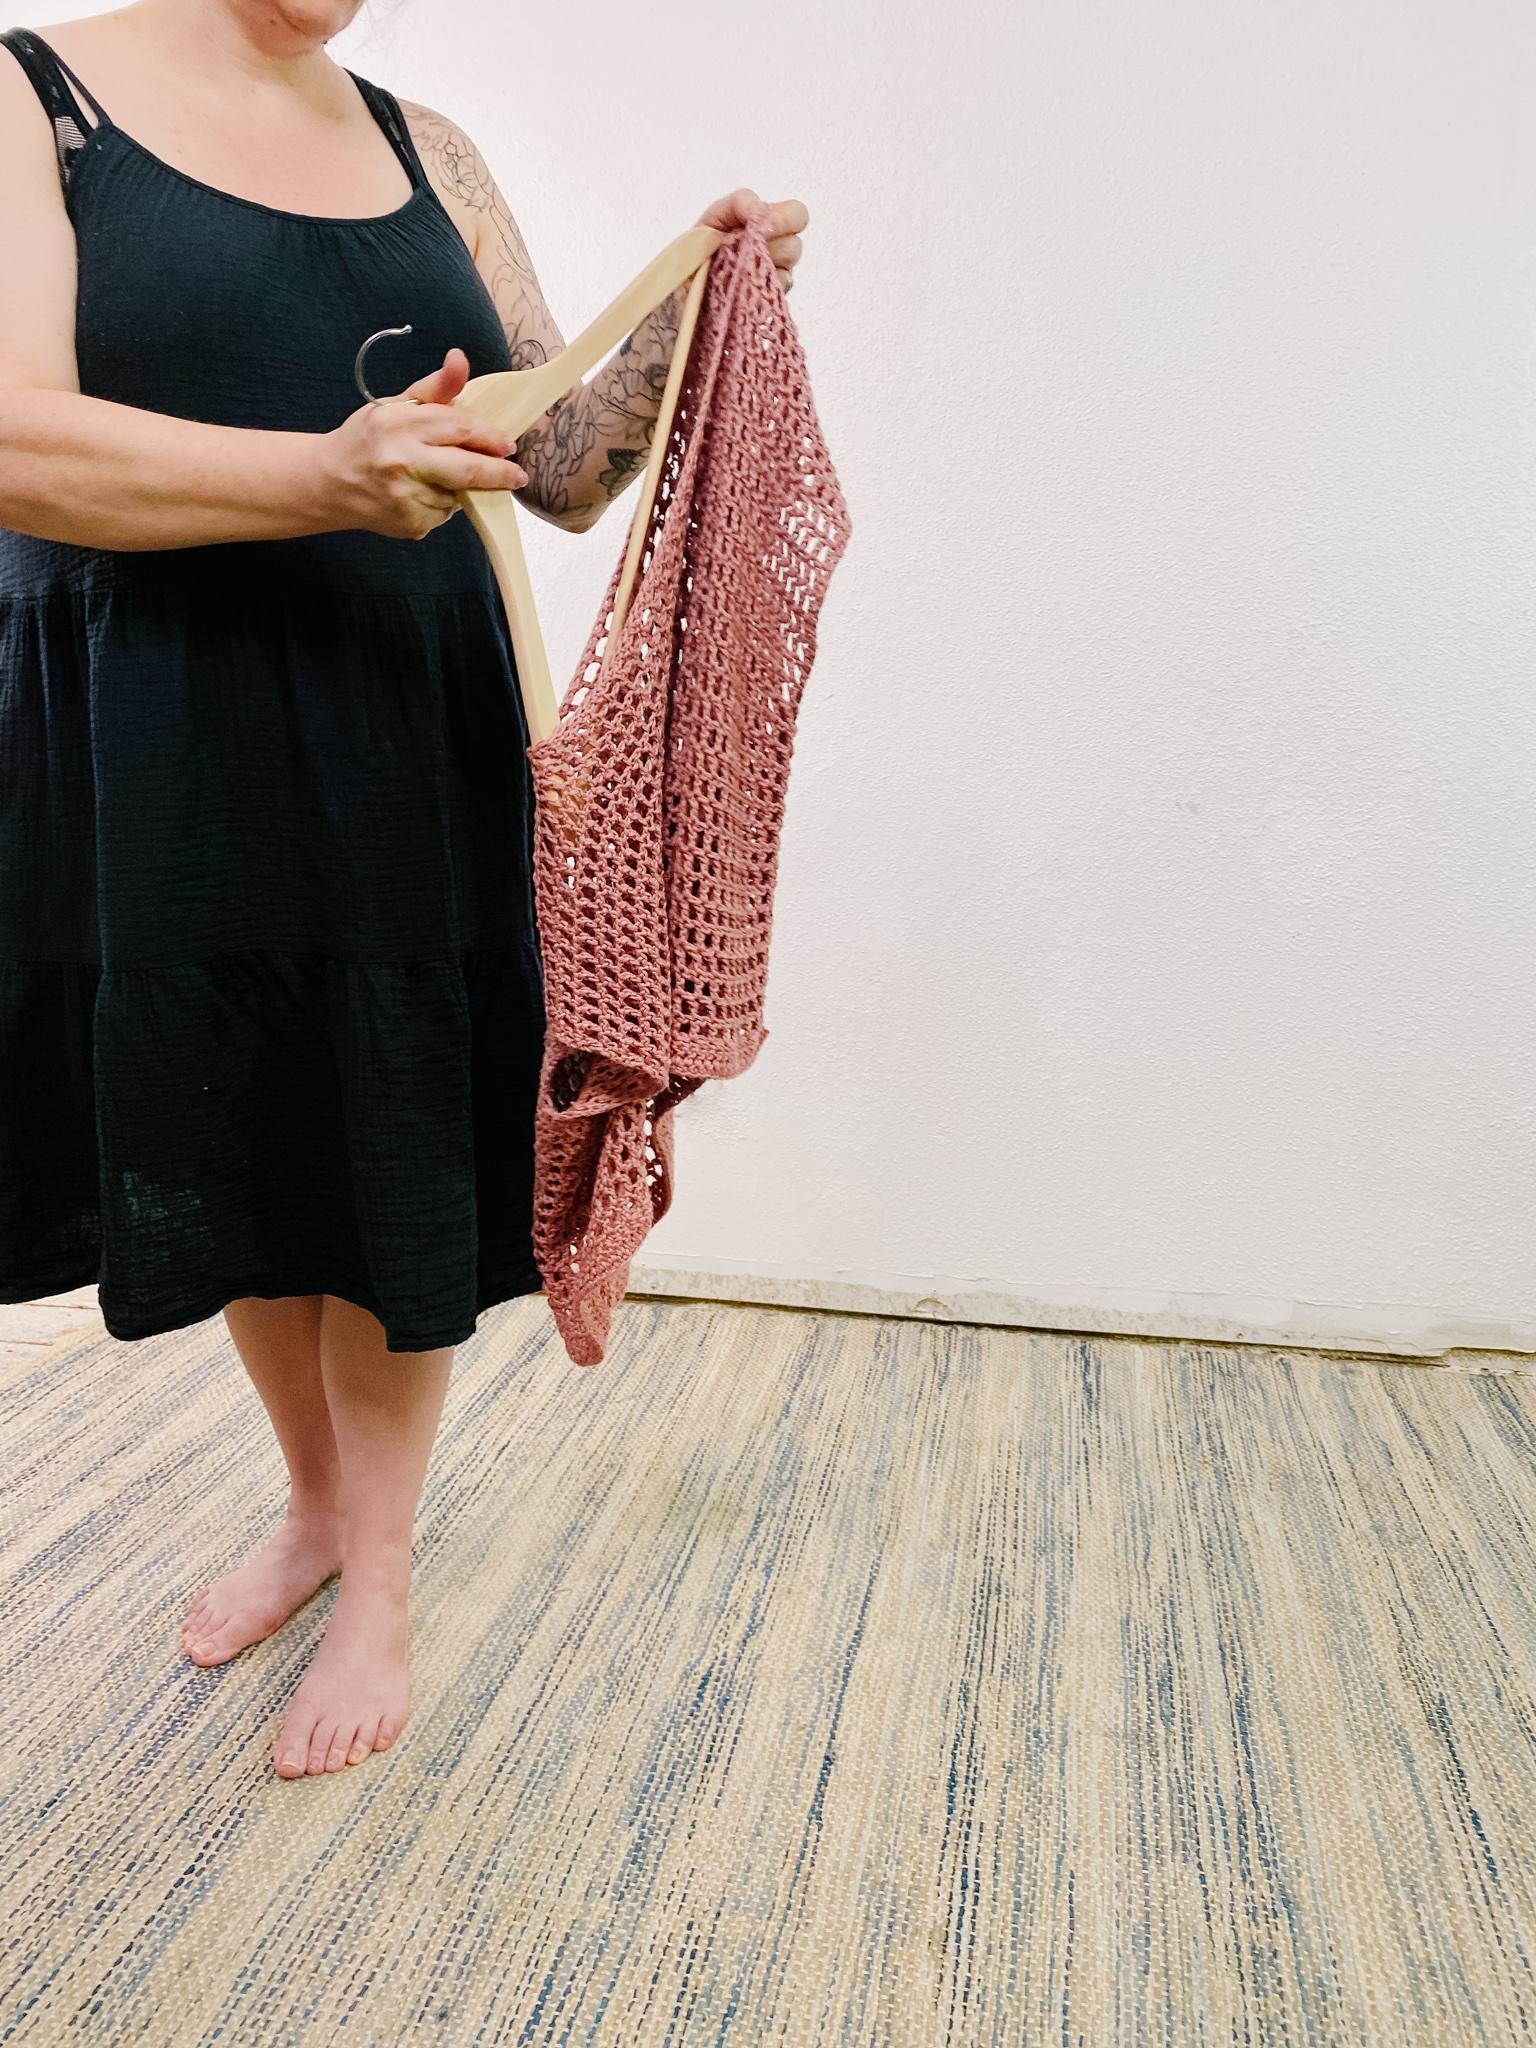 Lady holding pink crochet holdo tee with dark gray dress